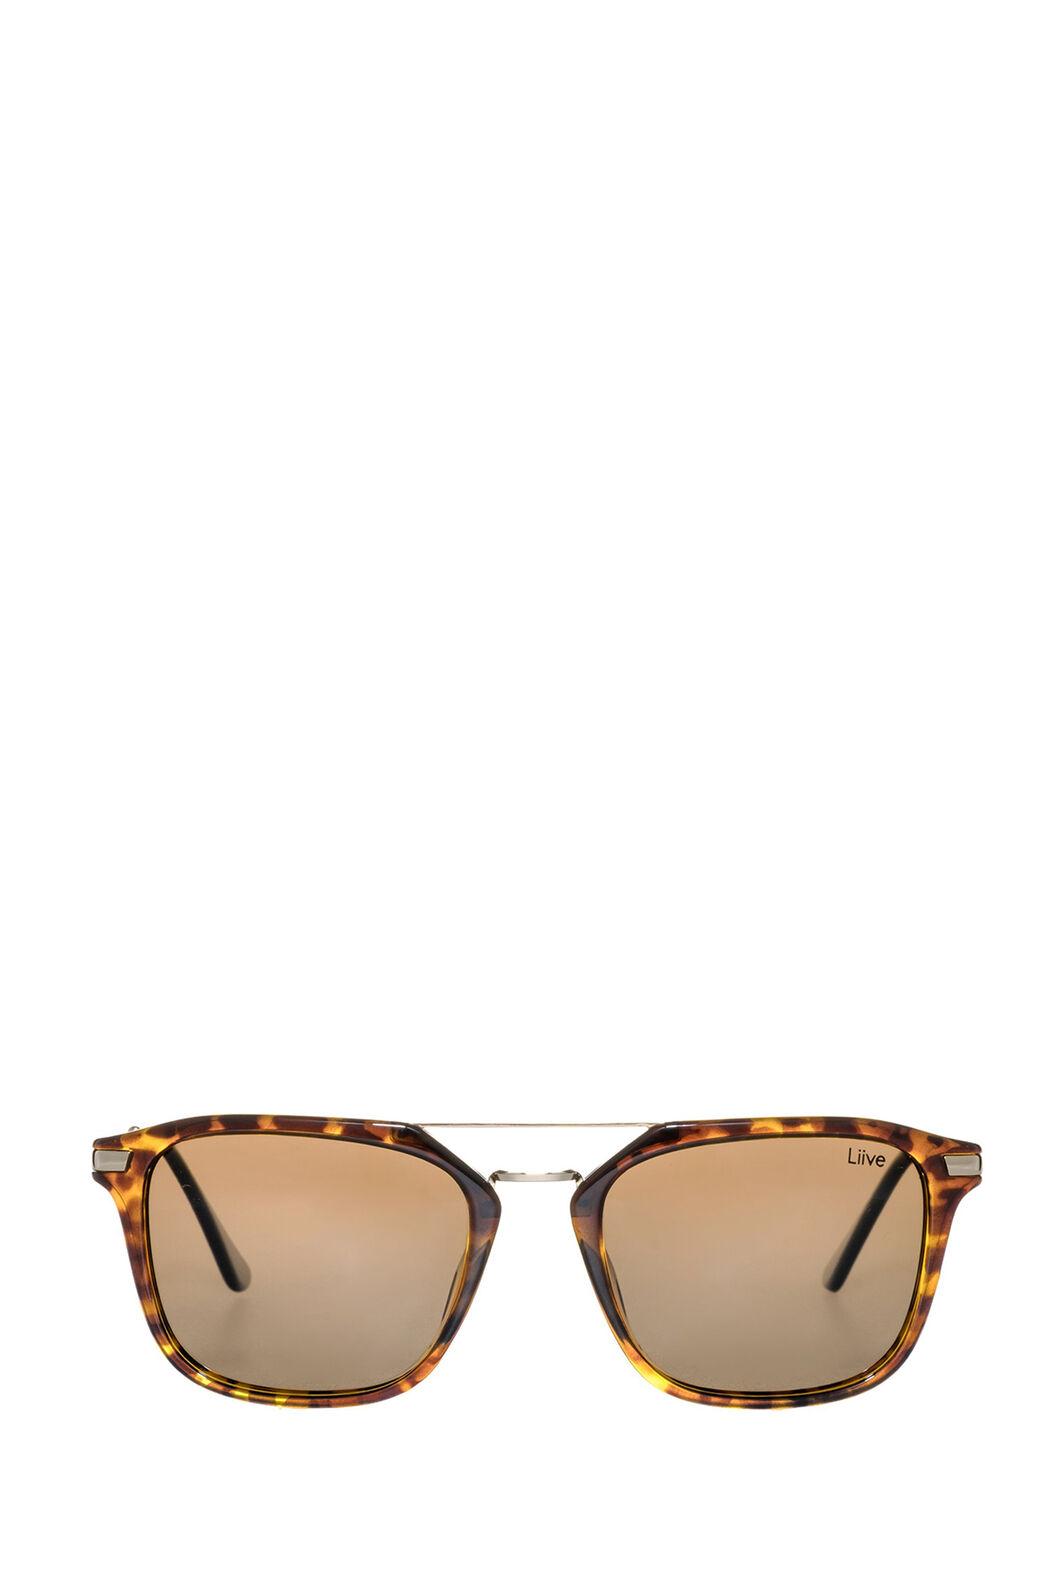 Liive Vision Shaz Polarised Sunglasses, TORT, hi-res